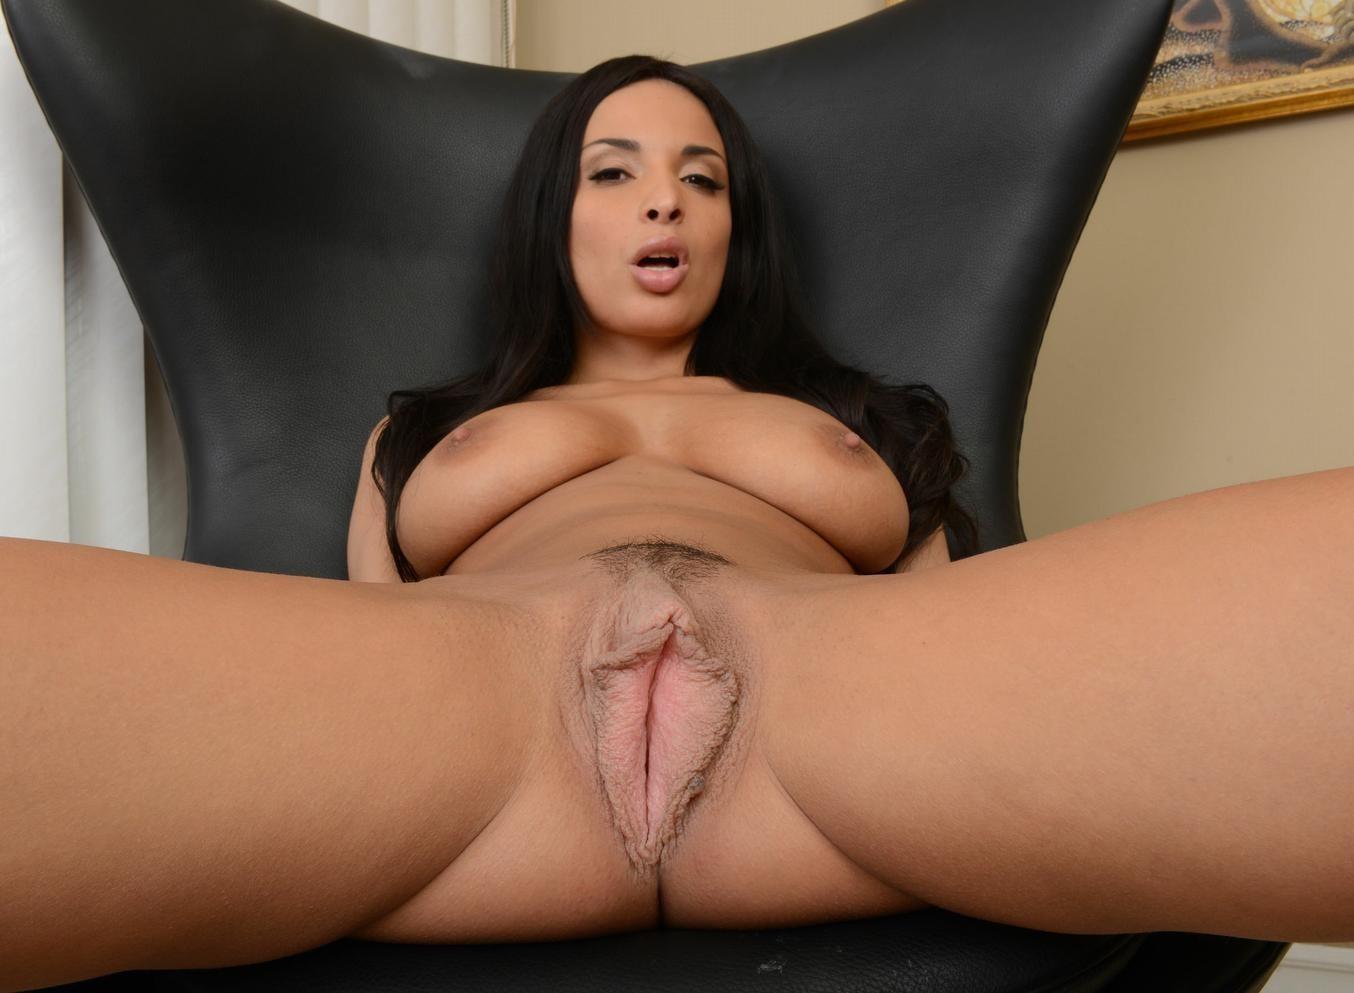 Thick bbw latina loses virginity